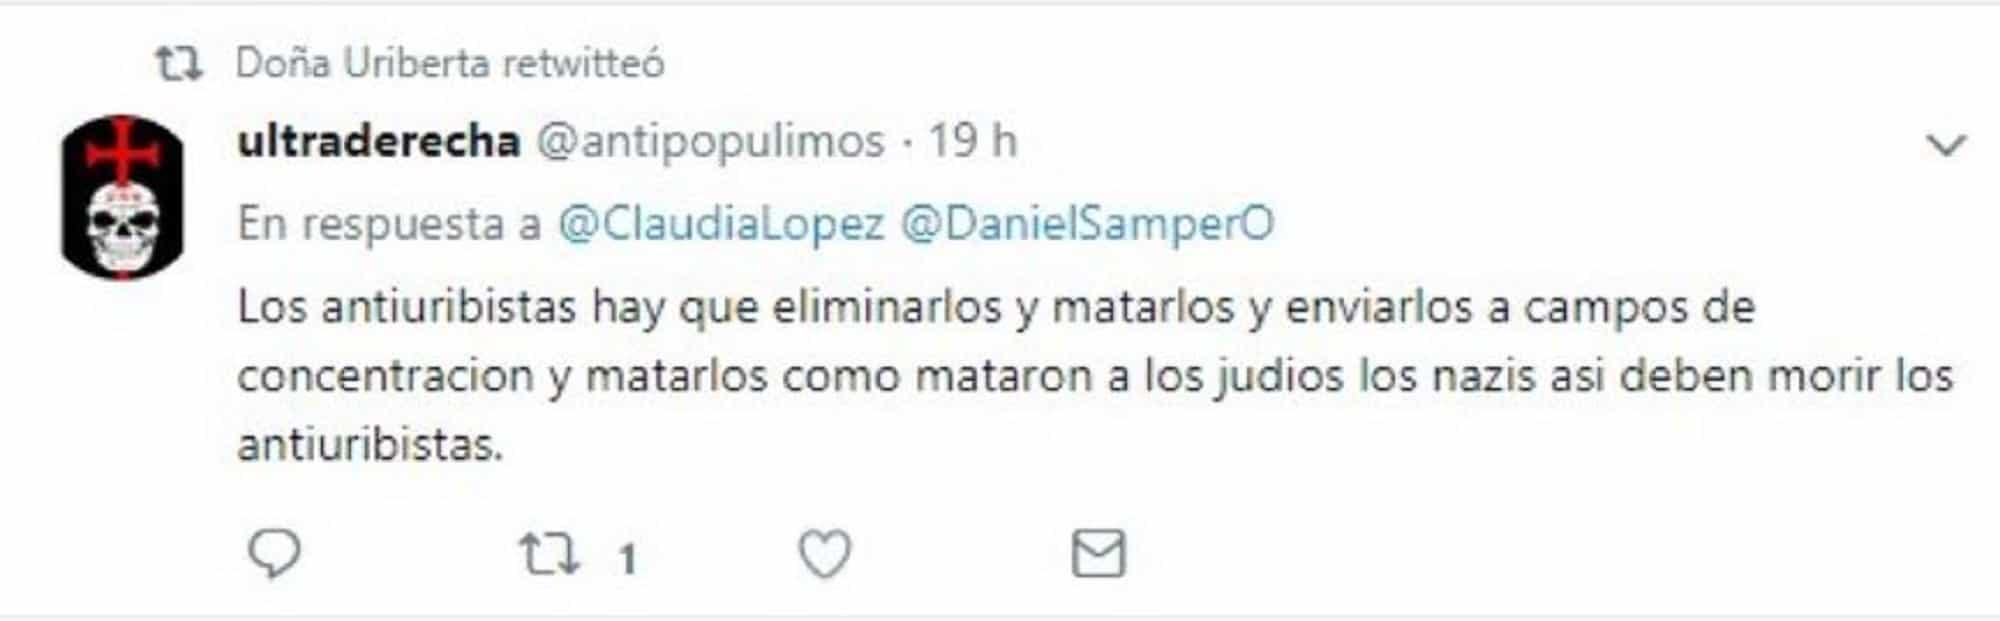 Amenaza a Daniel Samper y Claudia López